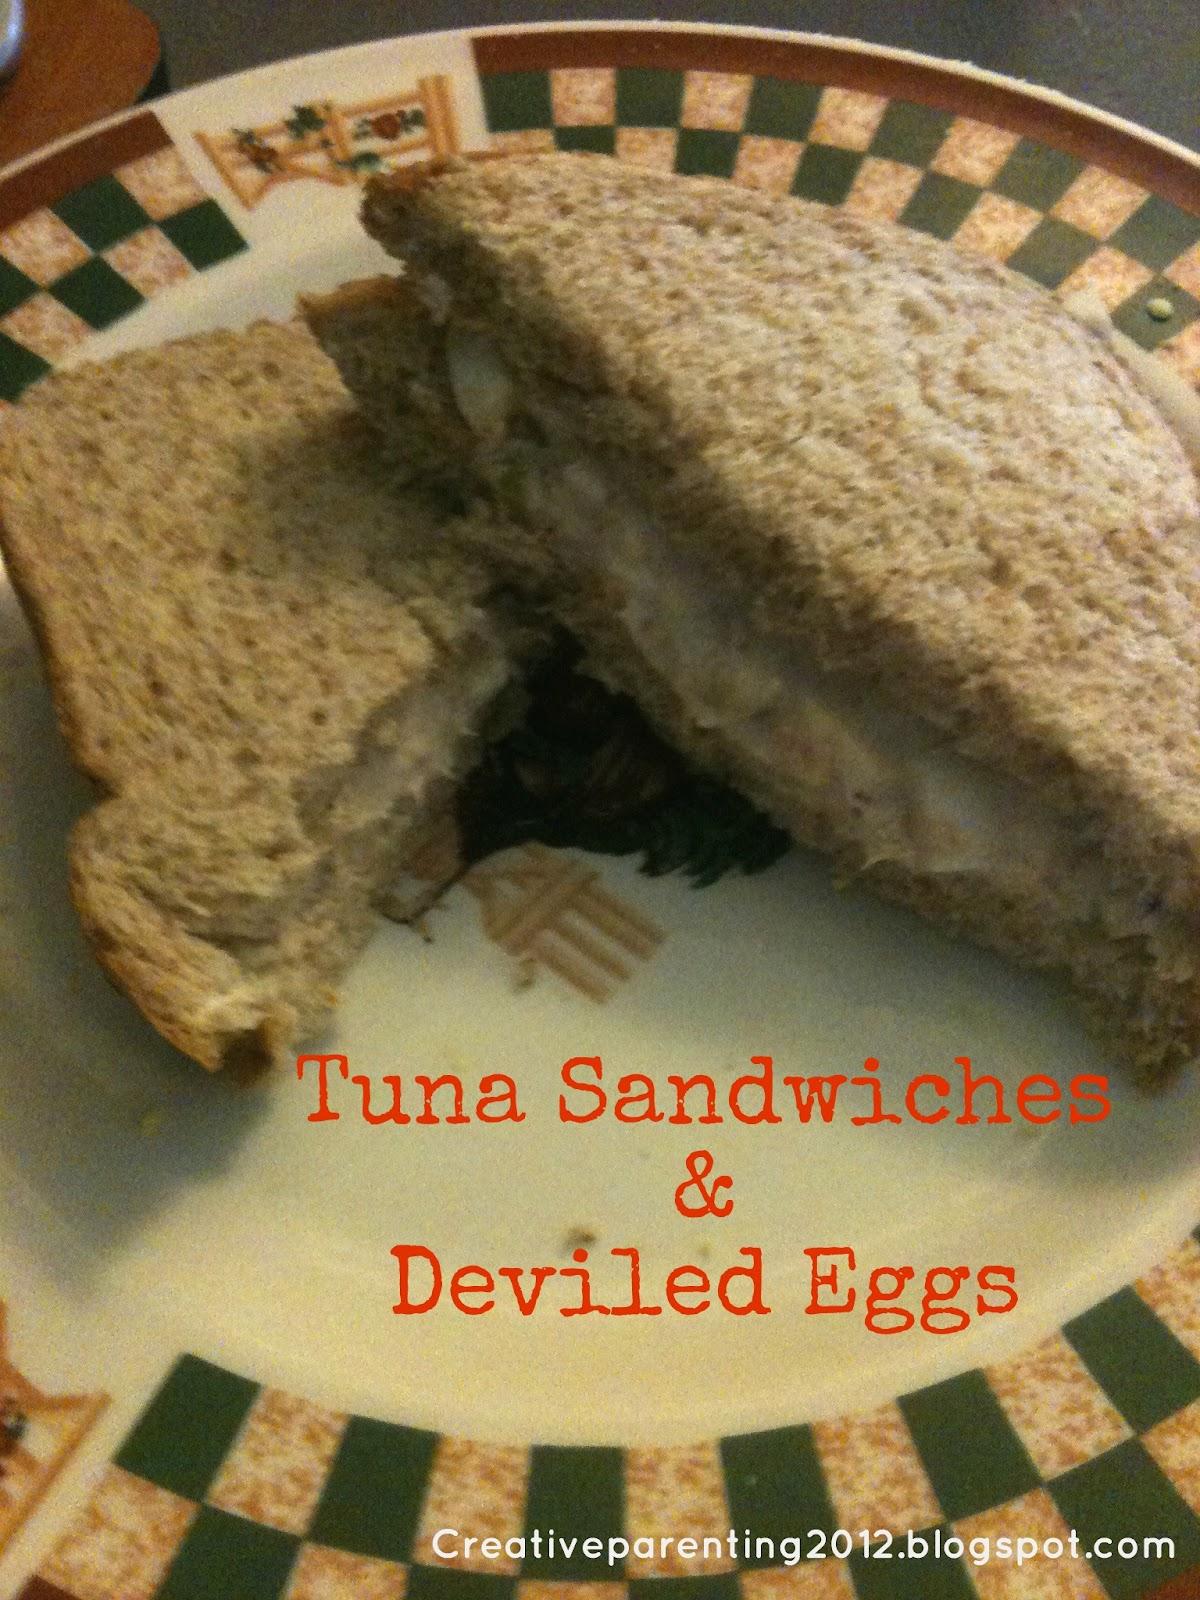 Creative Parenting: Recipe: Tuna Sandwiches and Deviled Eggs